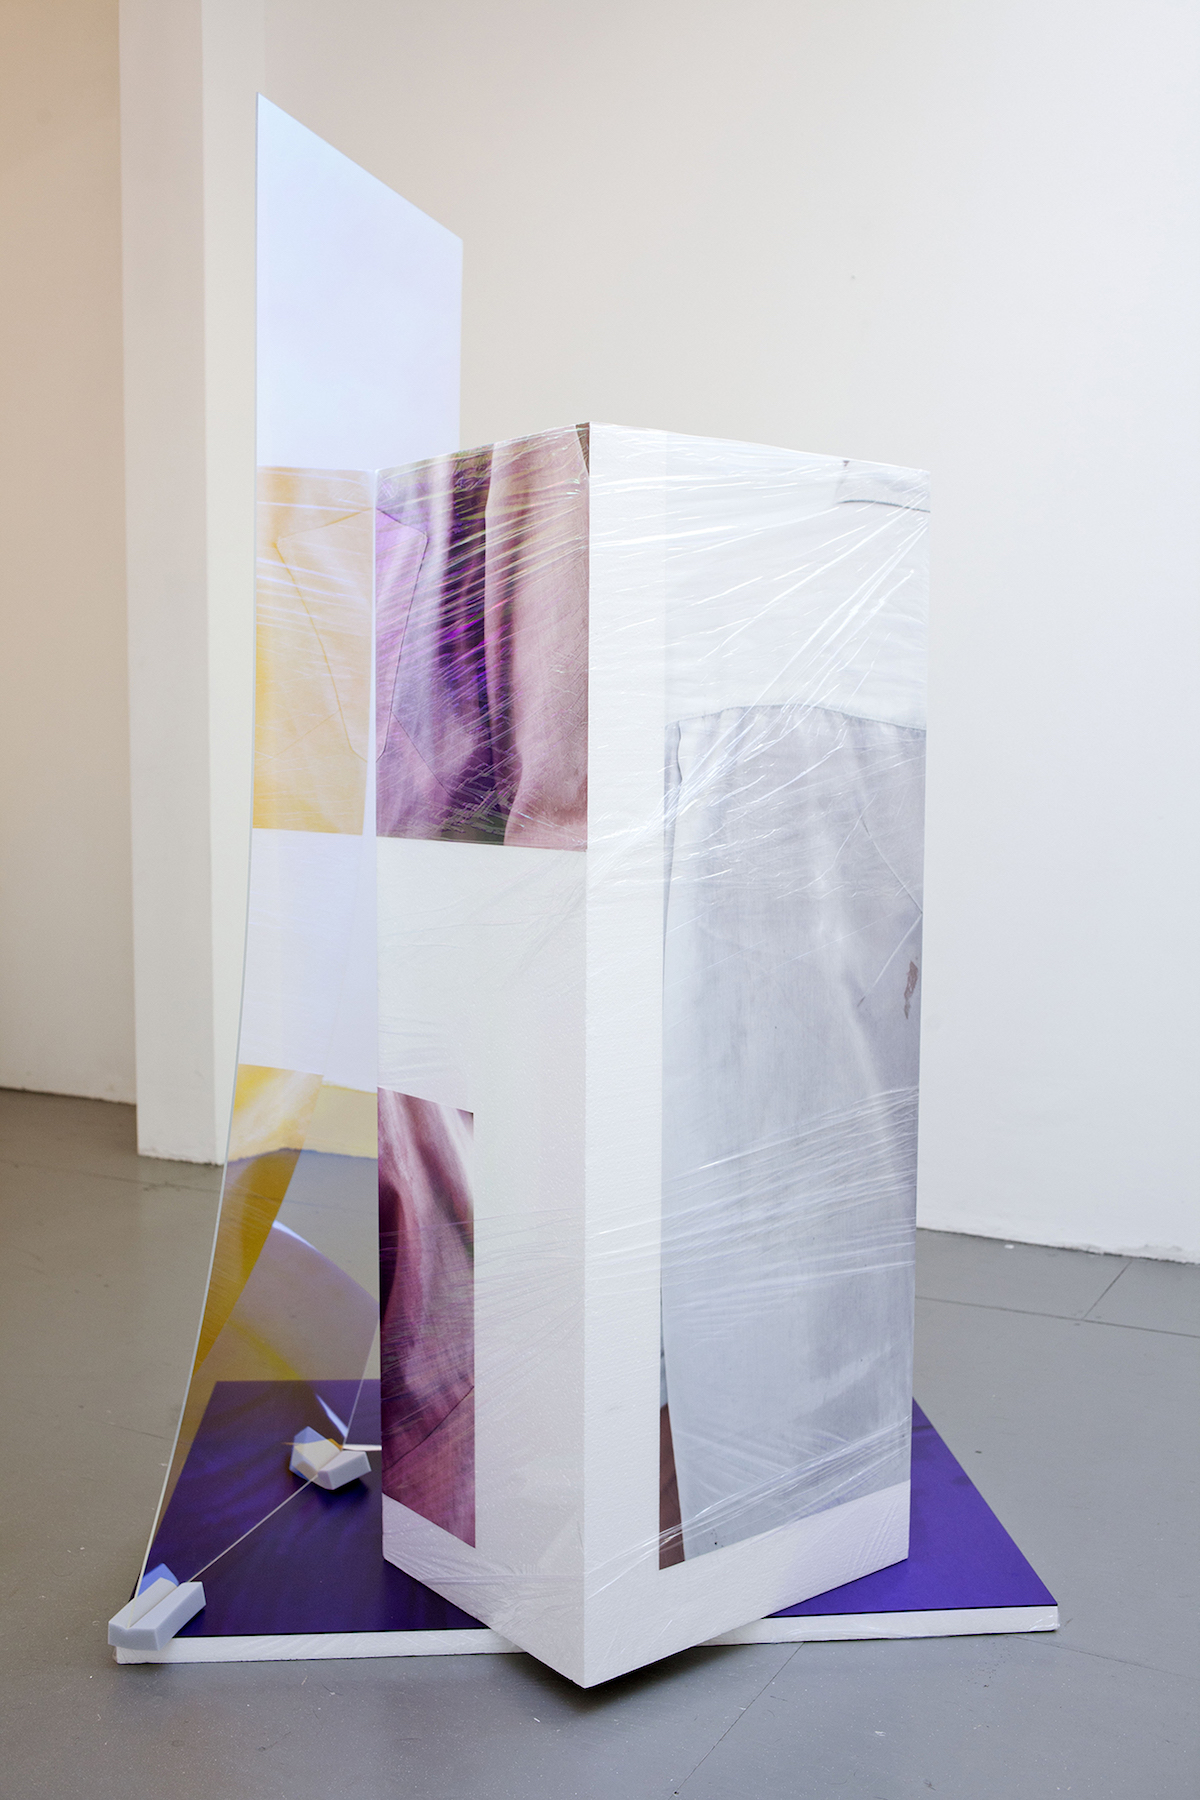 Sweaty Sculpture (back) ,167 x 90 x 107 cm, photo-stickers on polystyrene, cellophane, sponges, radiant plexiglass